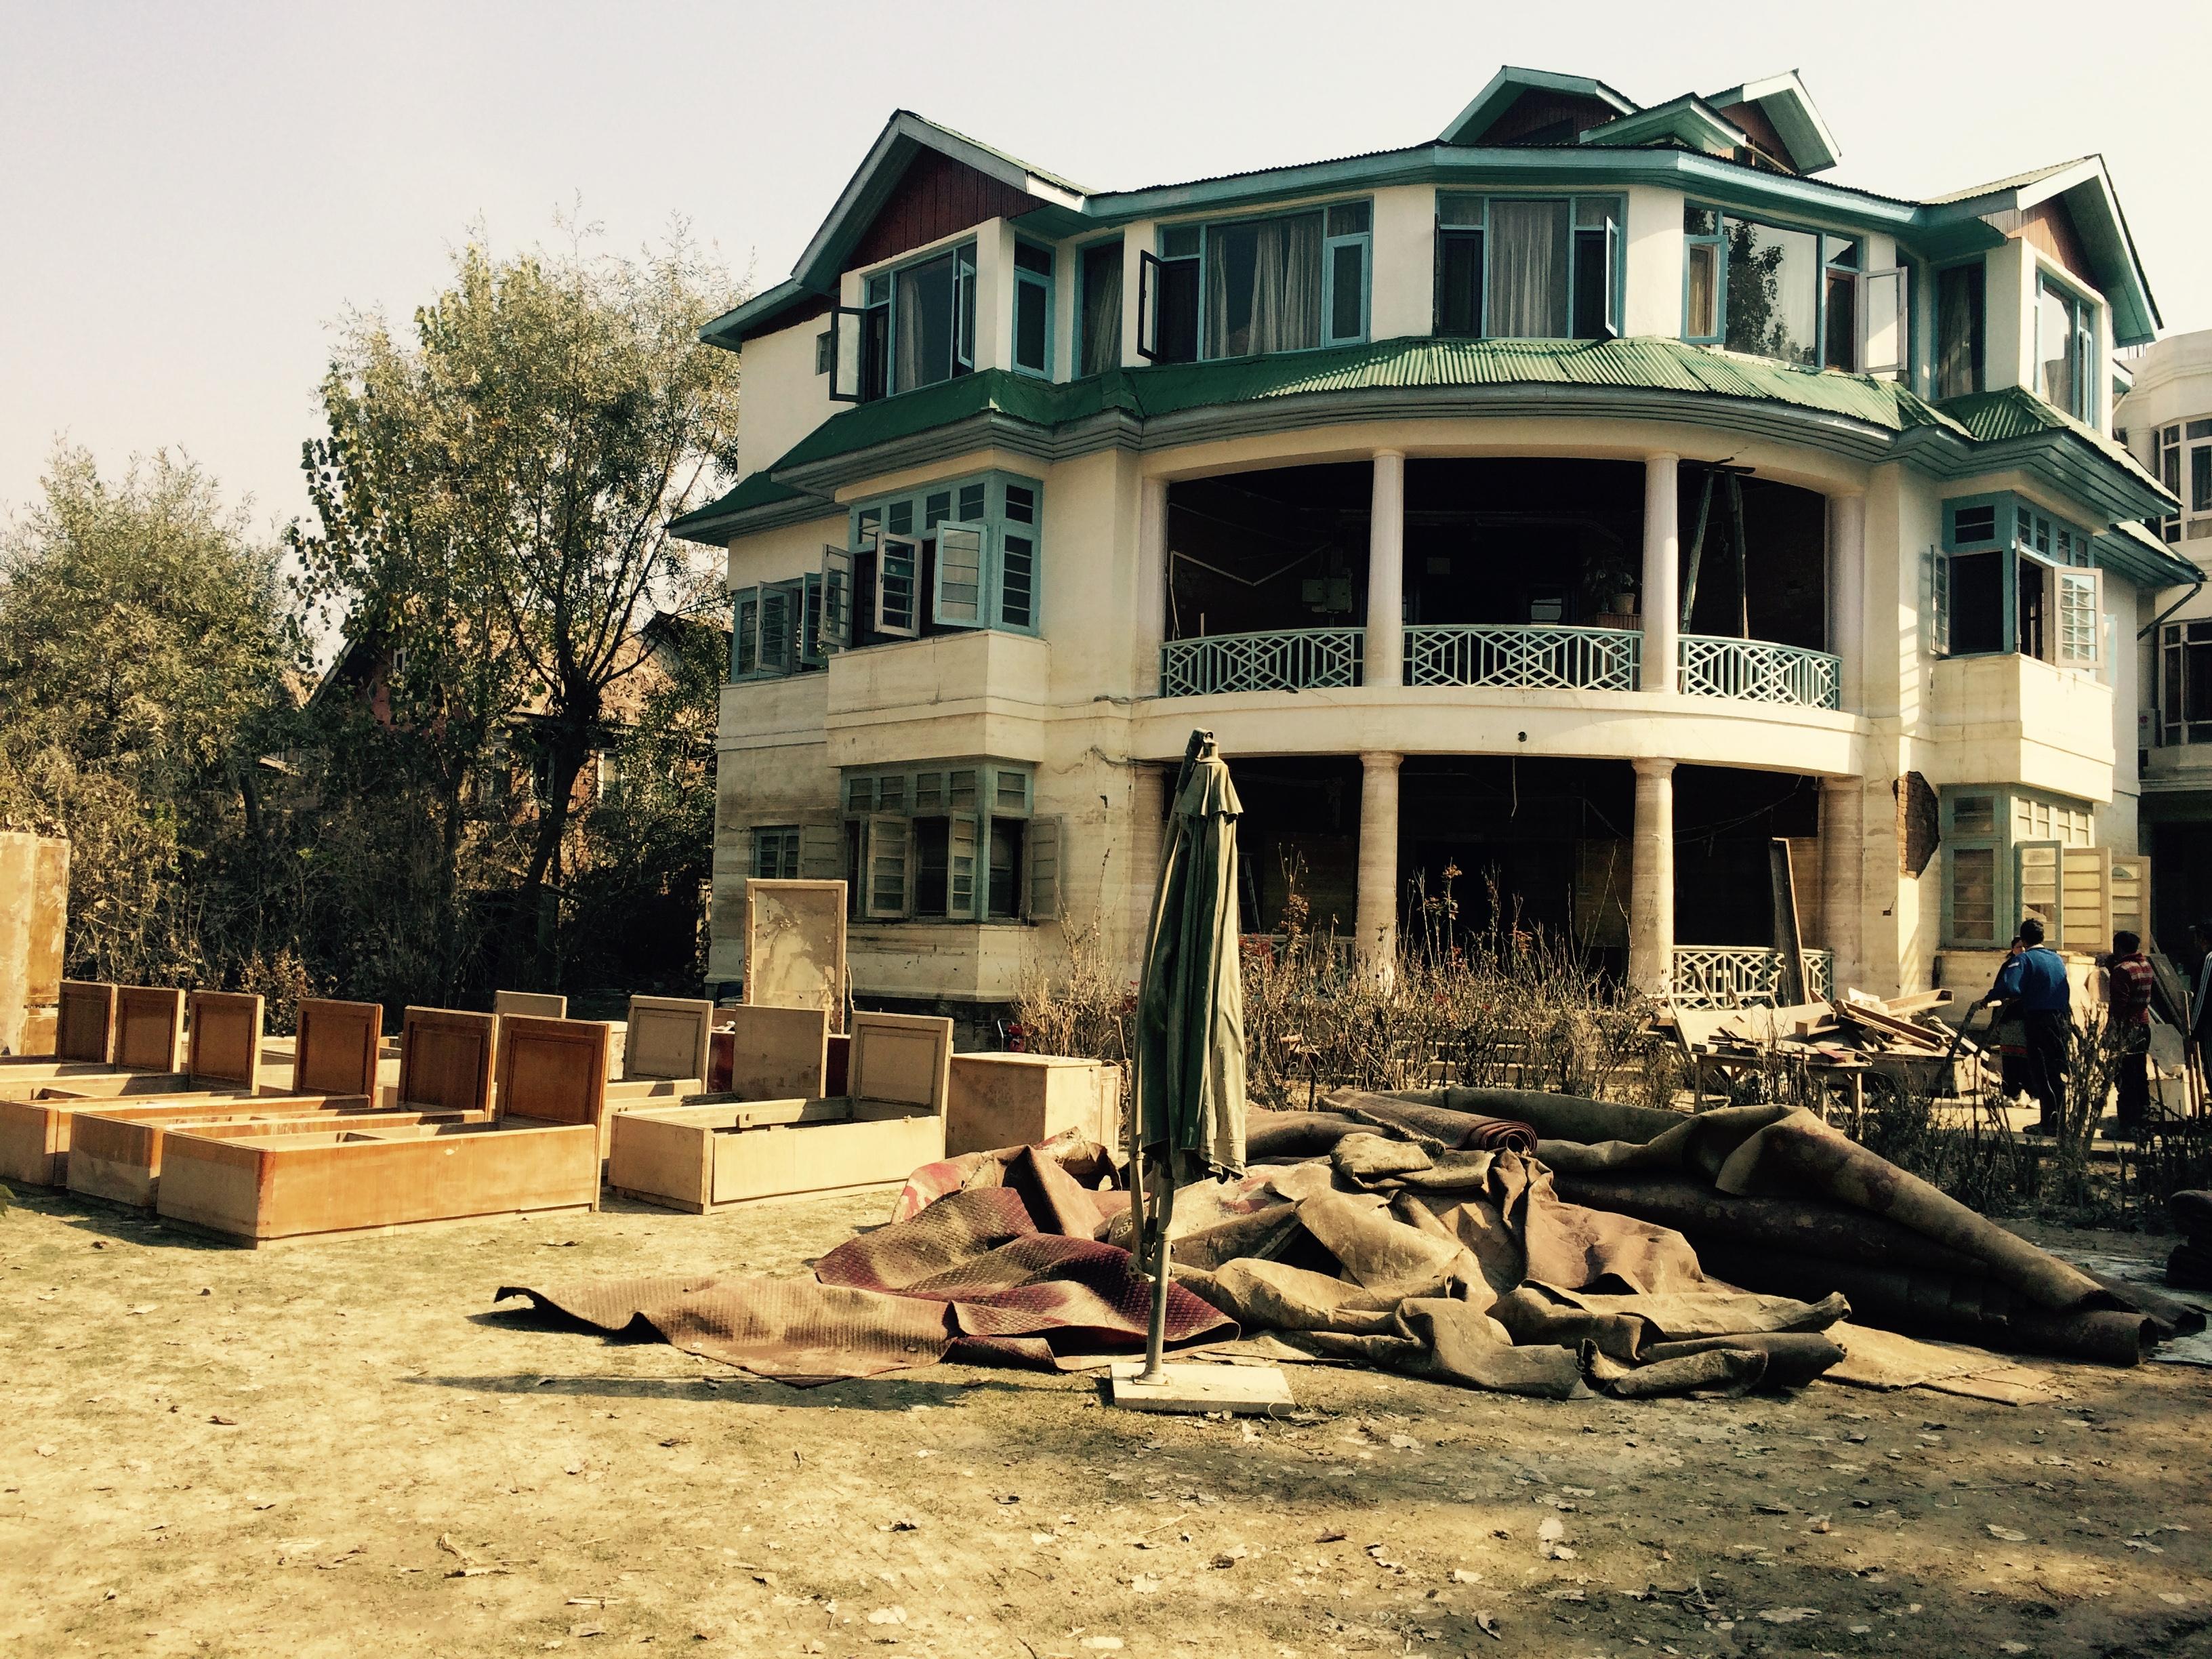 Cuckoo Wazir's sabred mansion in Rajbagh, Srinagar